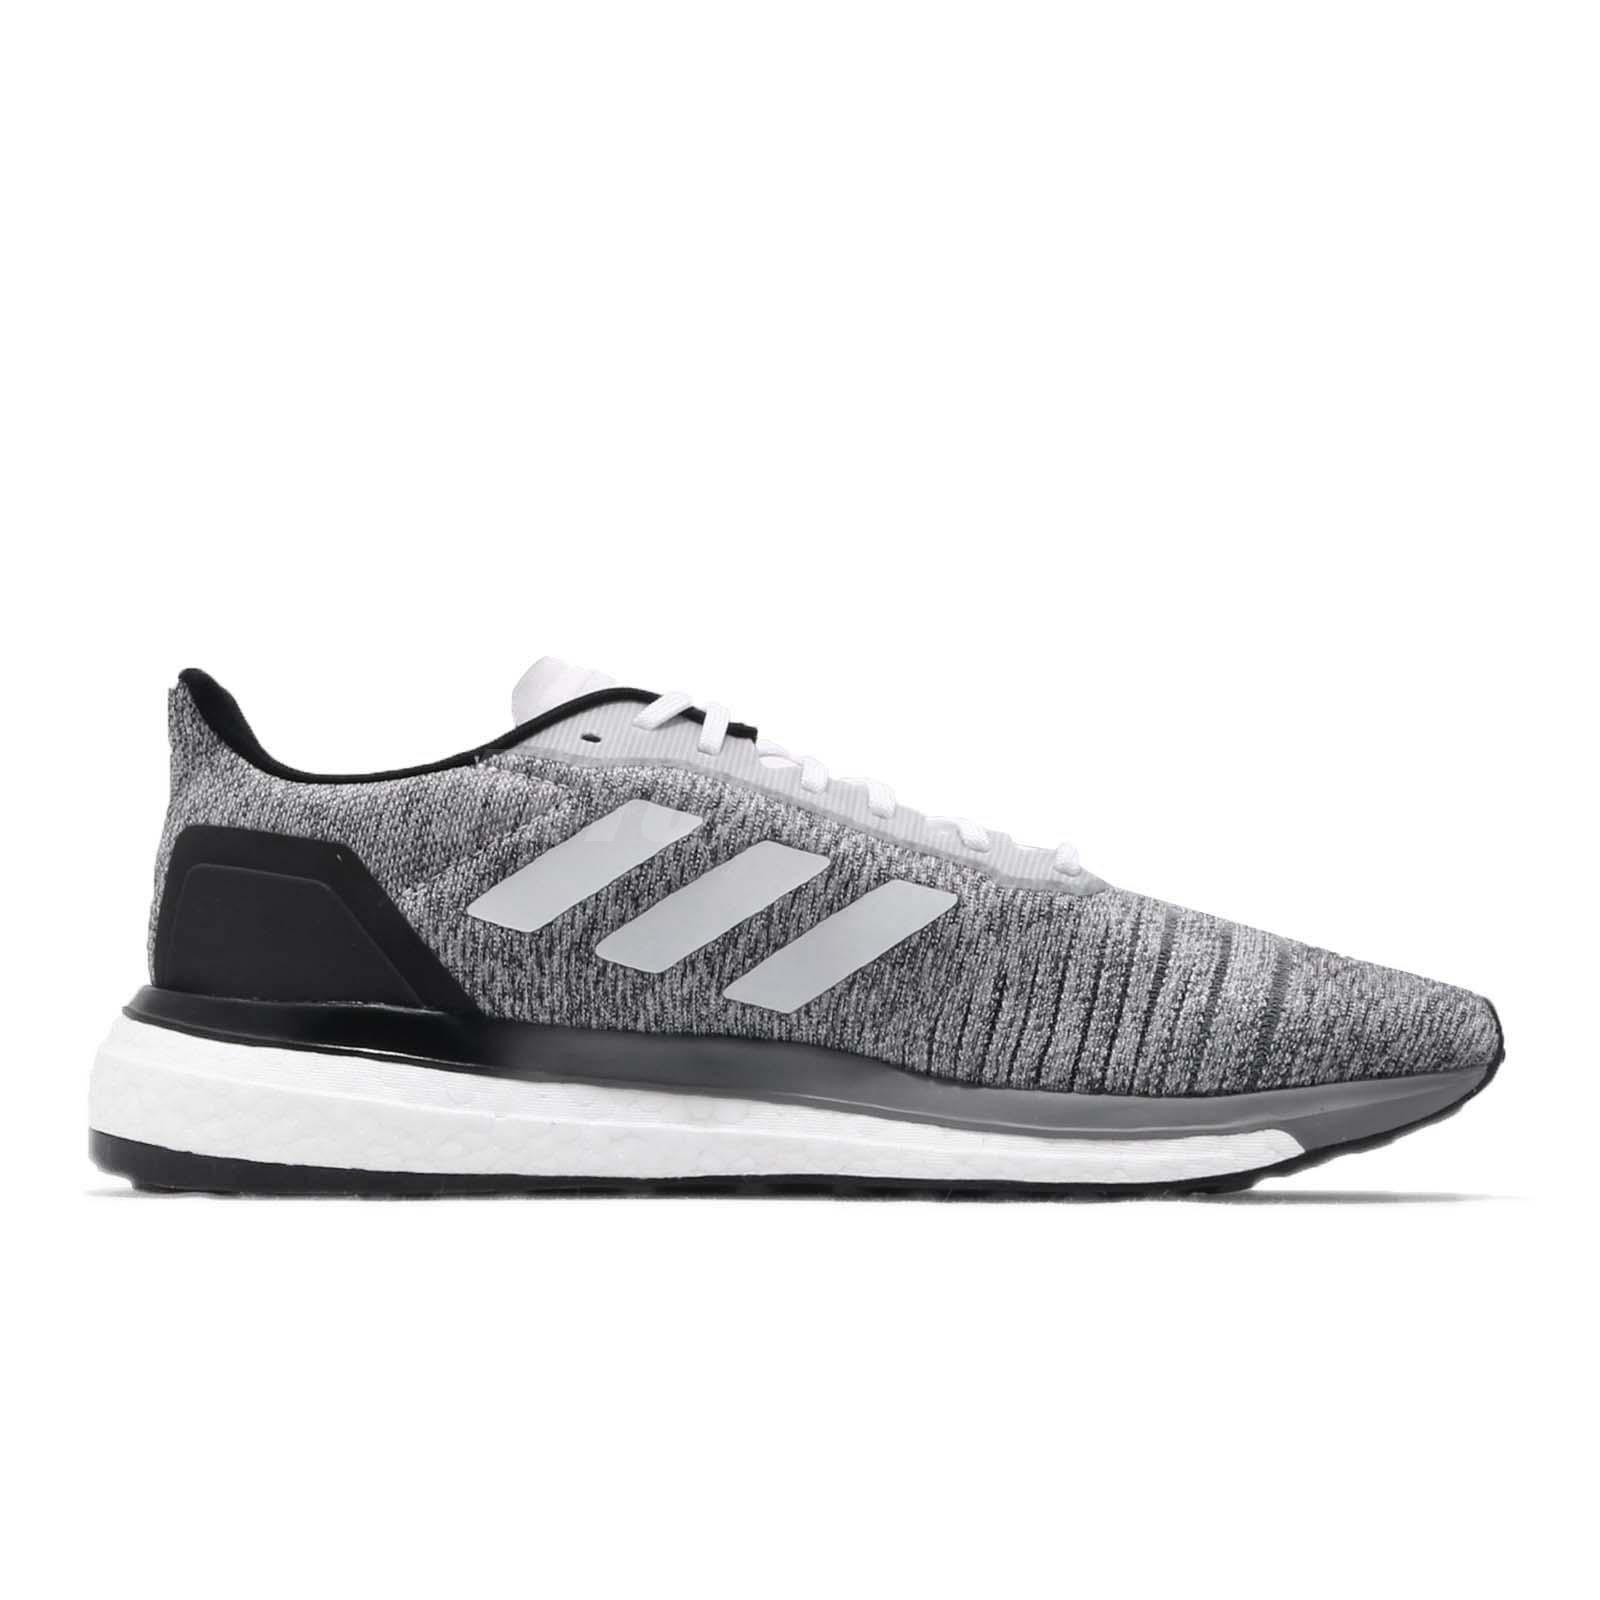 da22b8399 adidas Solar Drive M Boost Grey White Black Men Running Shoes ...